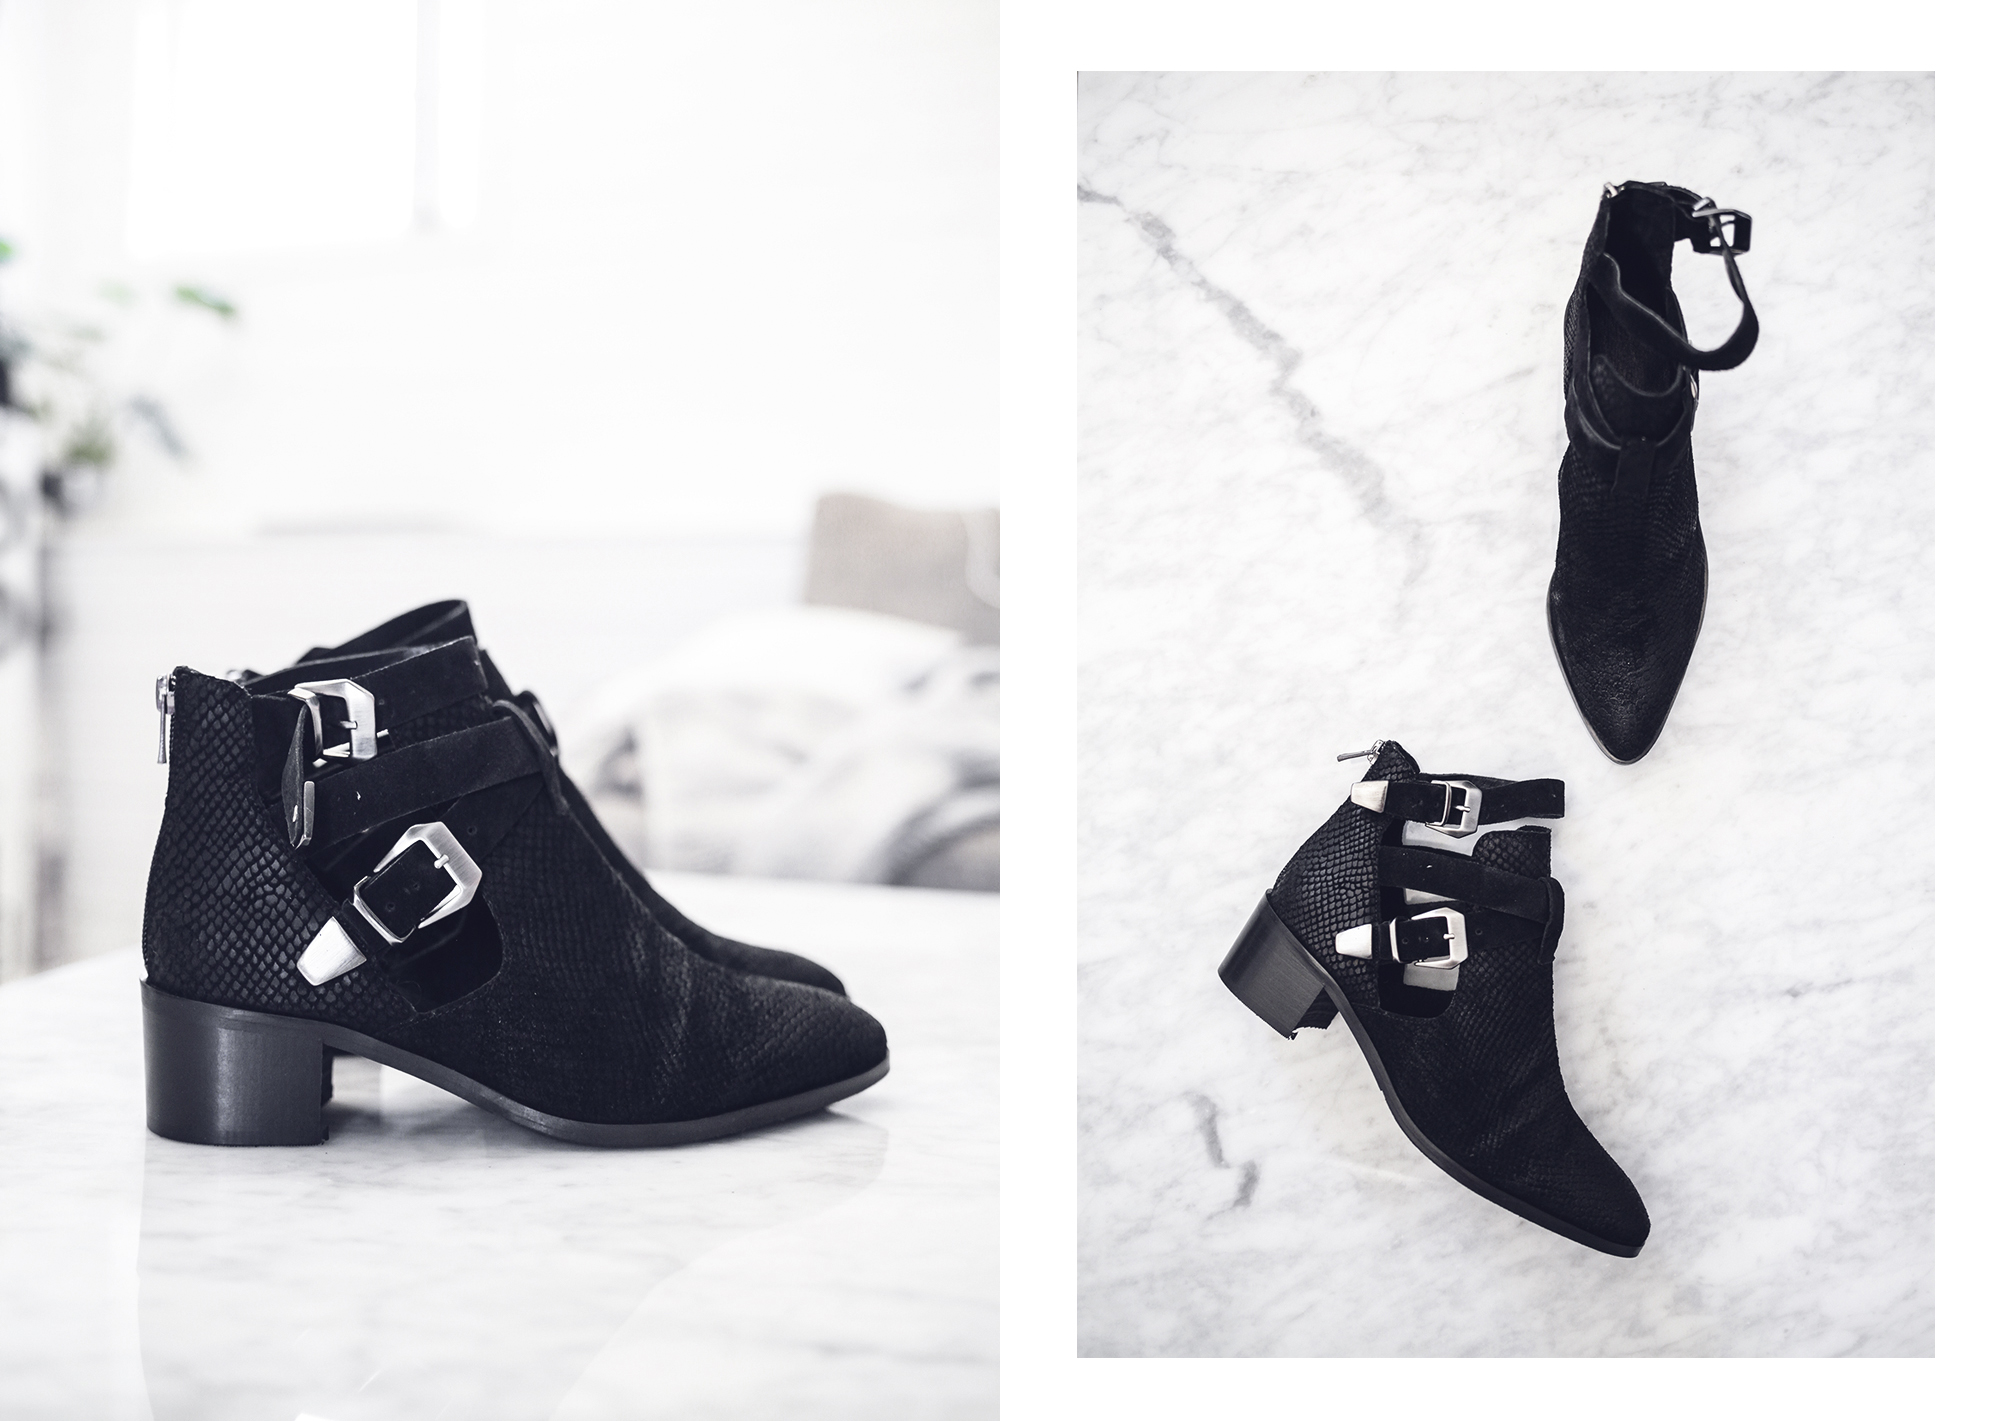 Bianco sko, Caroline Berg Eriksen